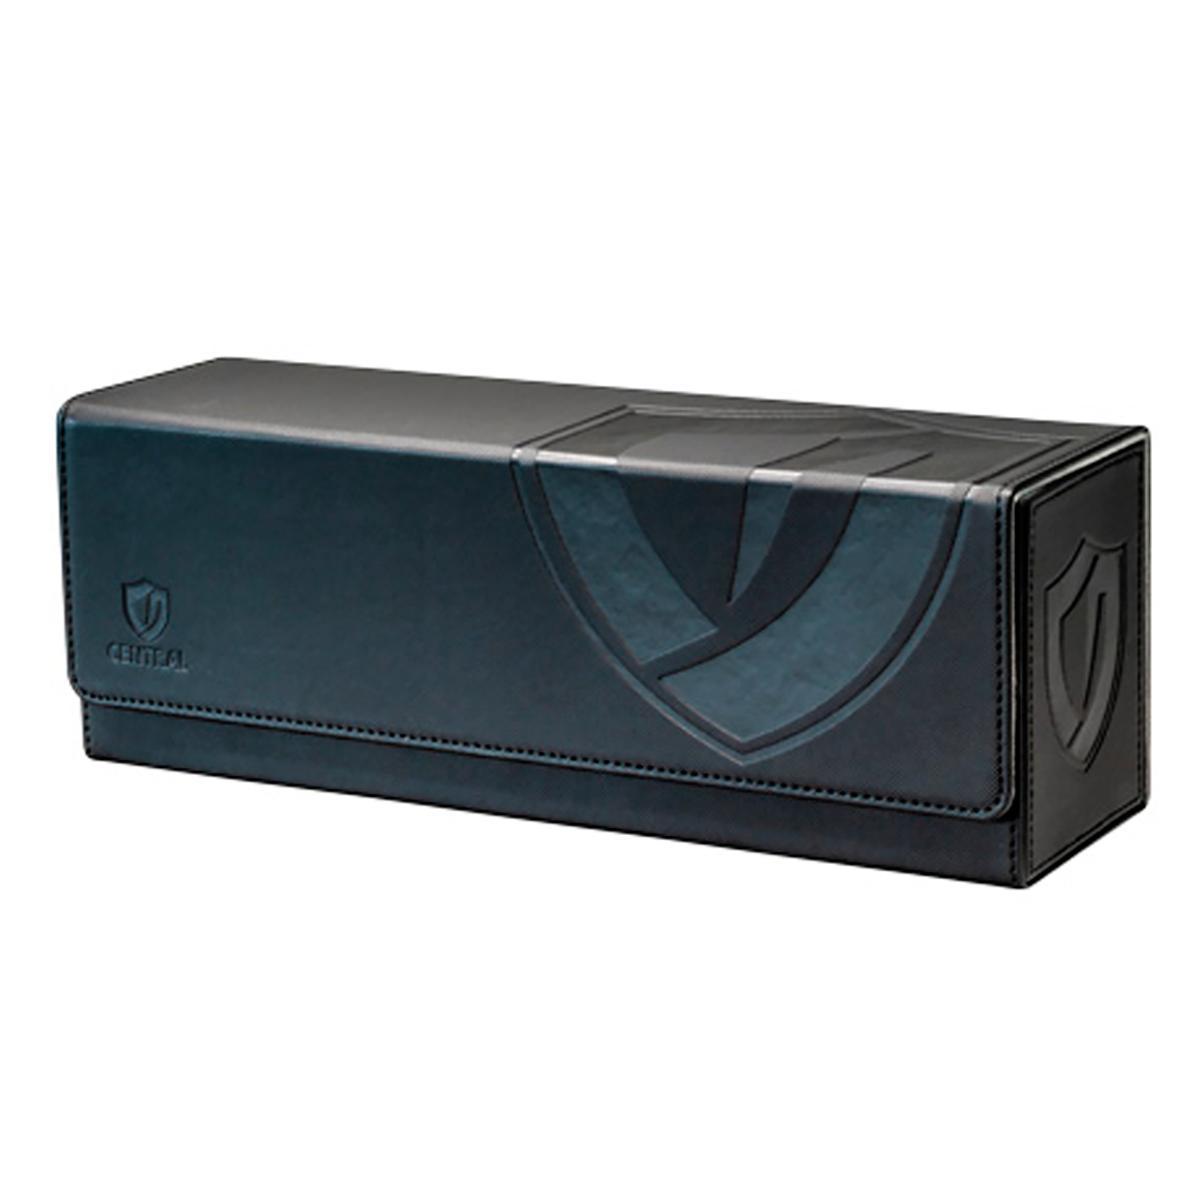 Deck Box Central Arca 400 +